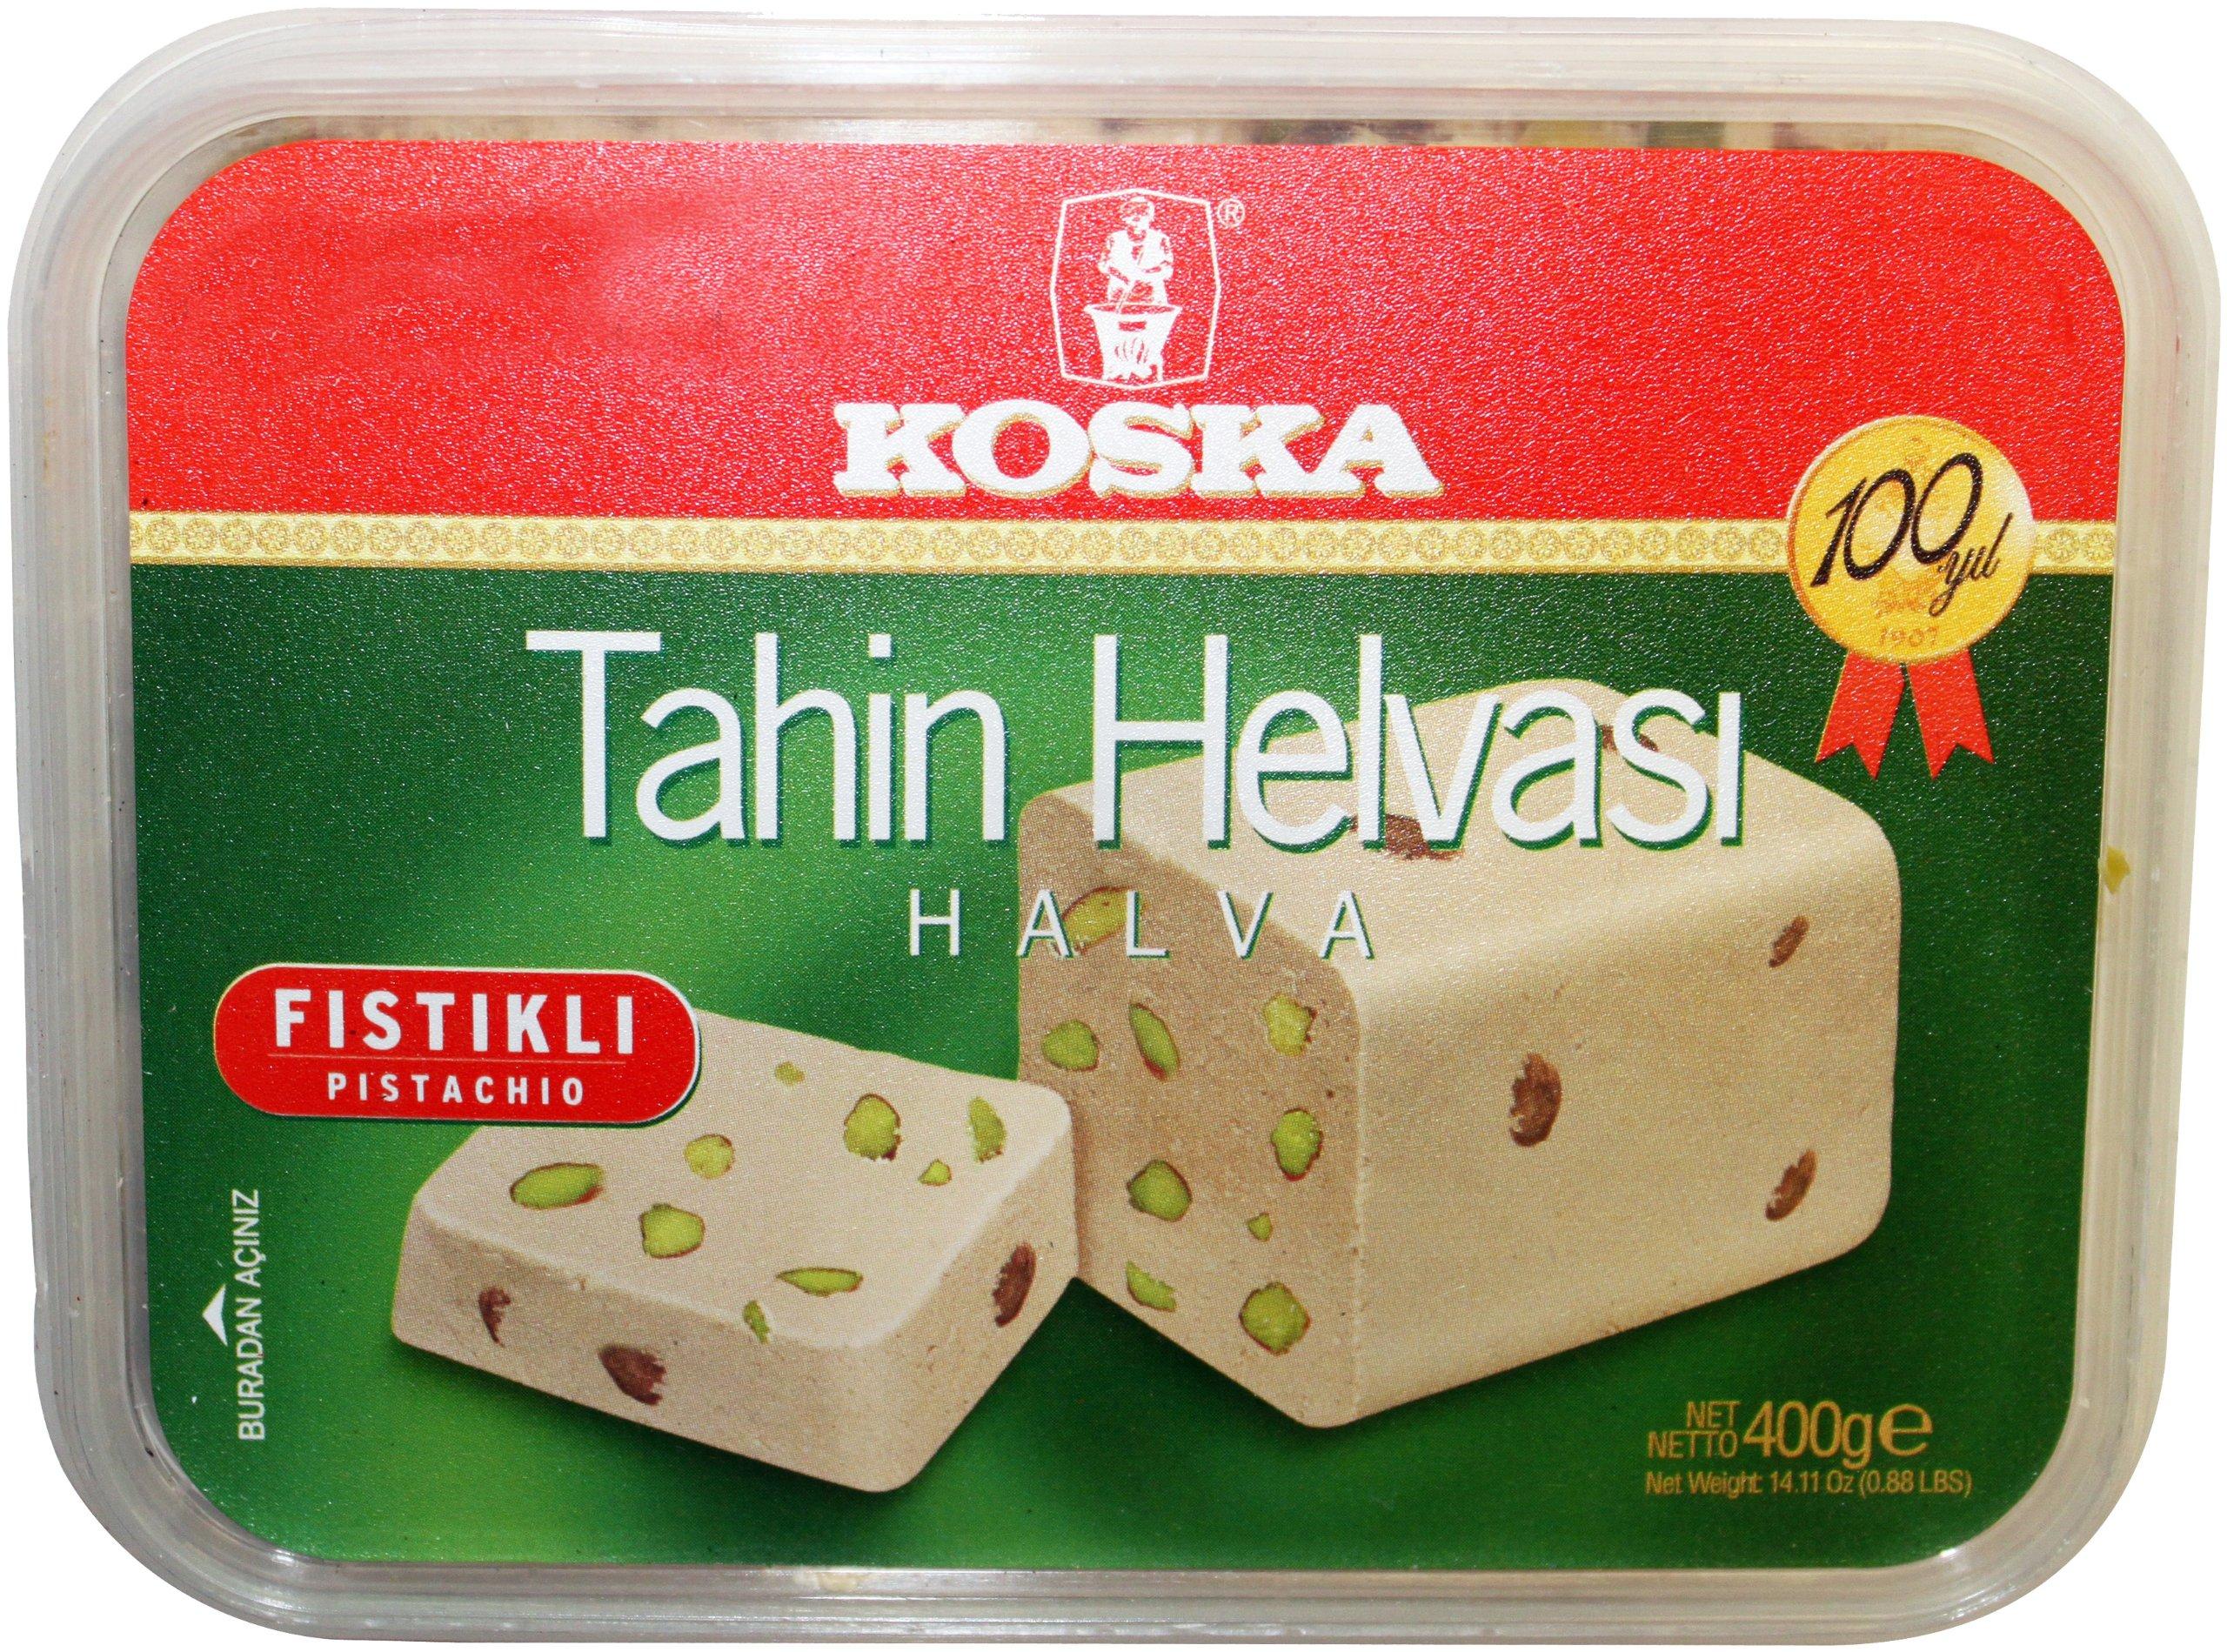 Koska Halva Pistachio, 400-Gram Boxes (Pack of 2) by Koska